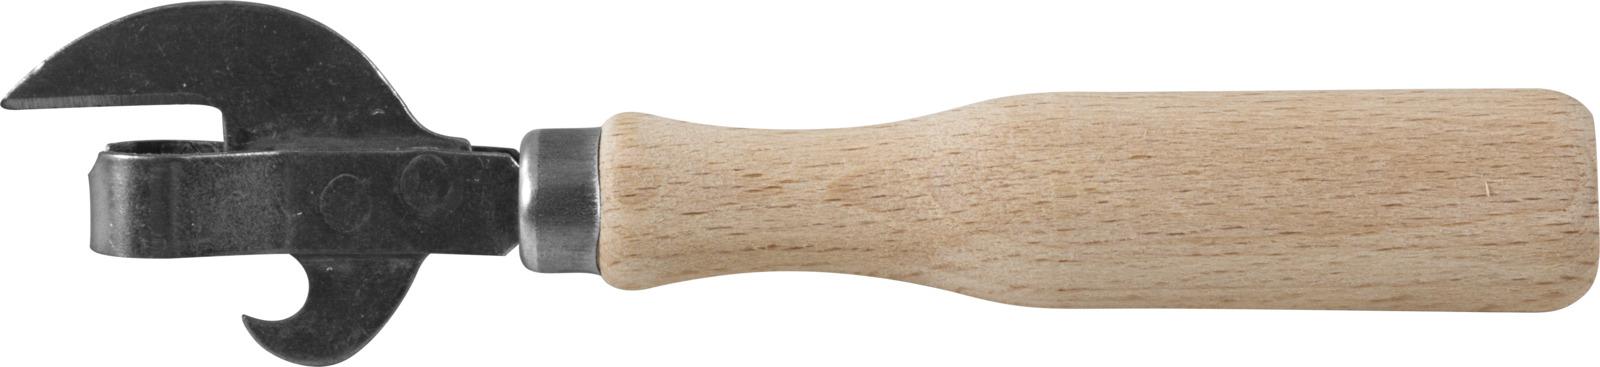 "Нож консервный Mallony ""Эконом"", 160 мм"